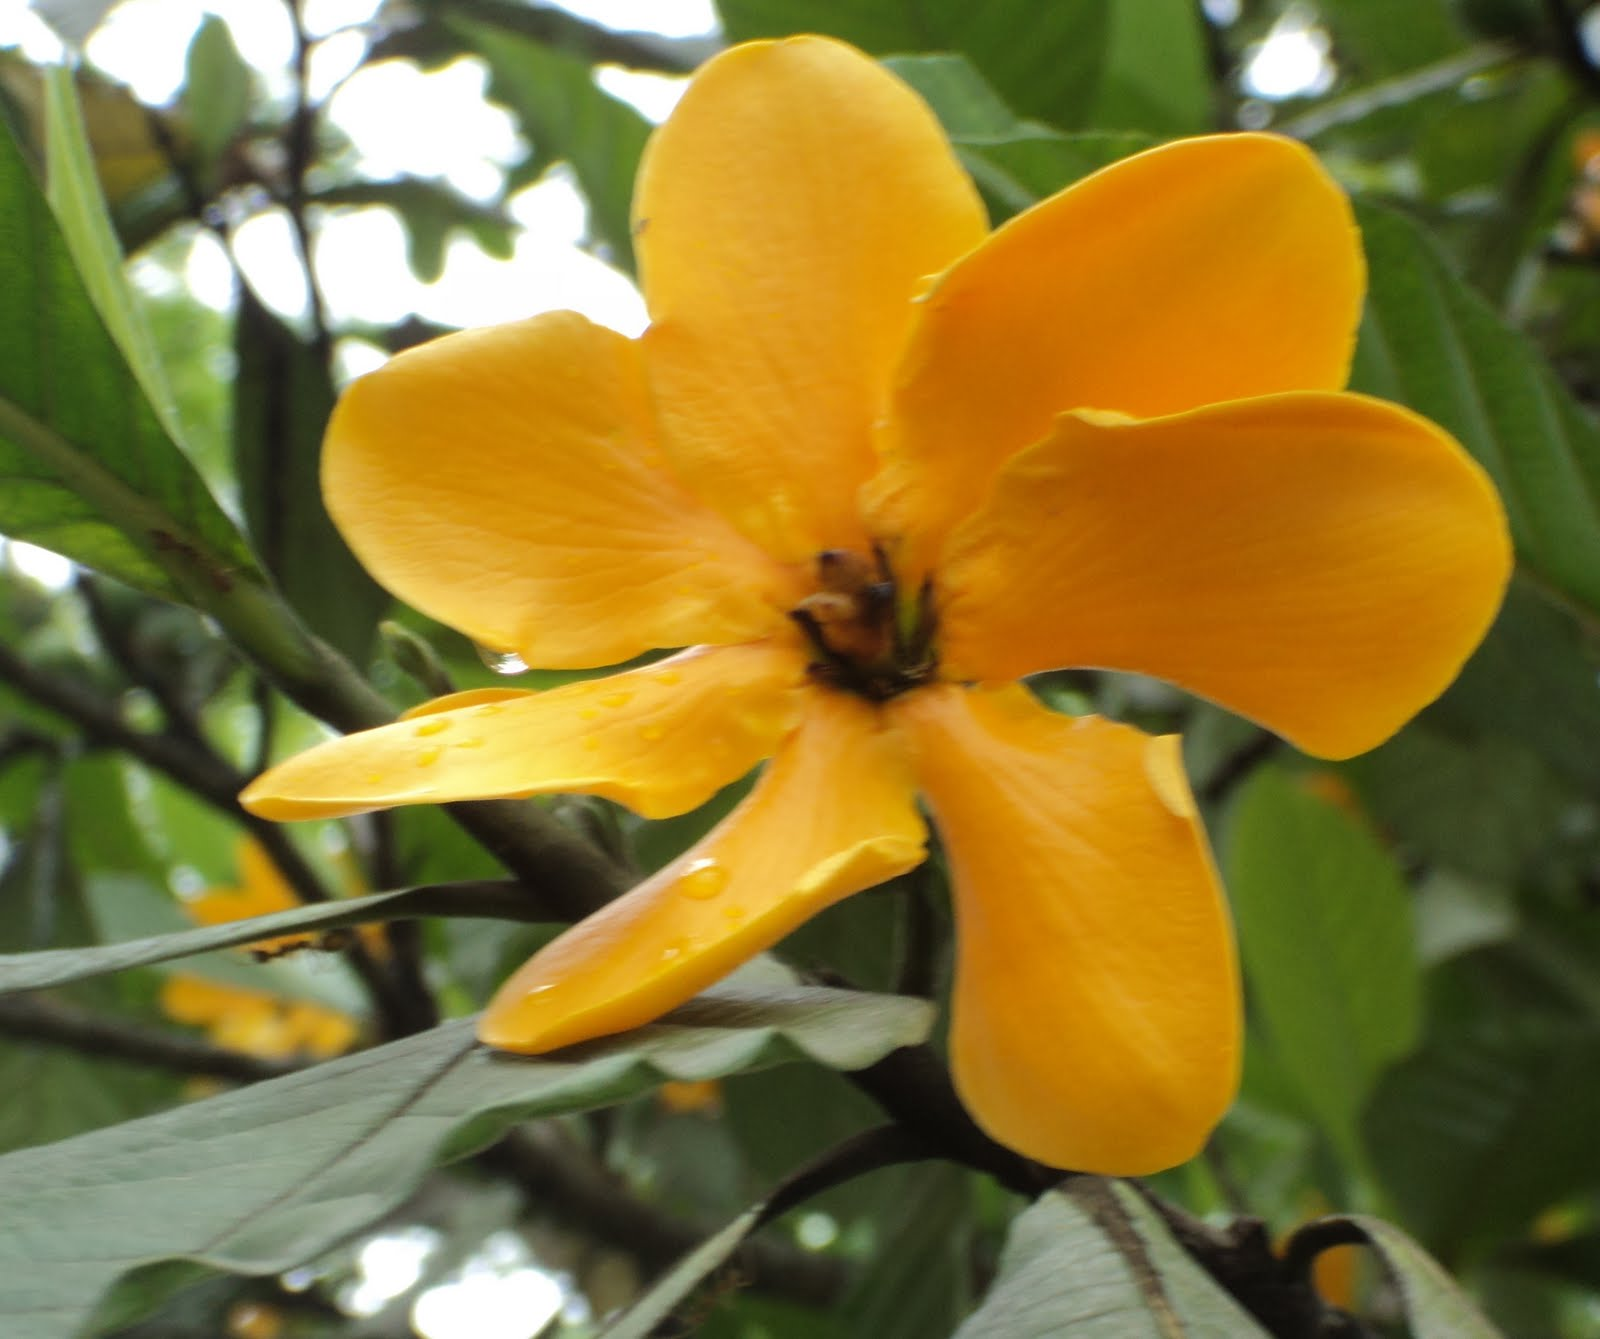 My Sarawak 2nd Ed January Flowering Trees Of Bintulu Part 3